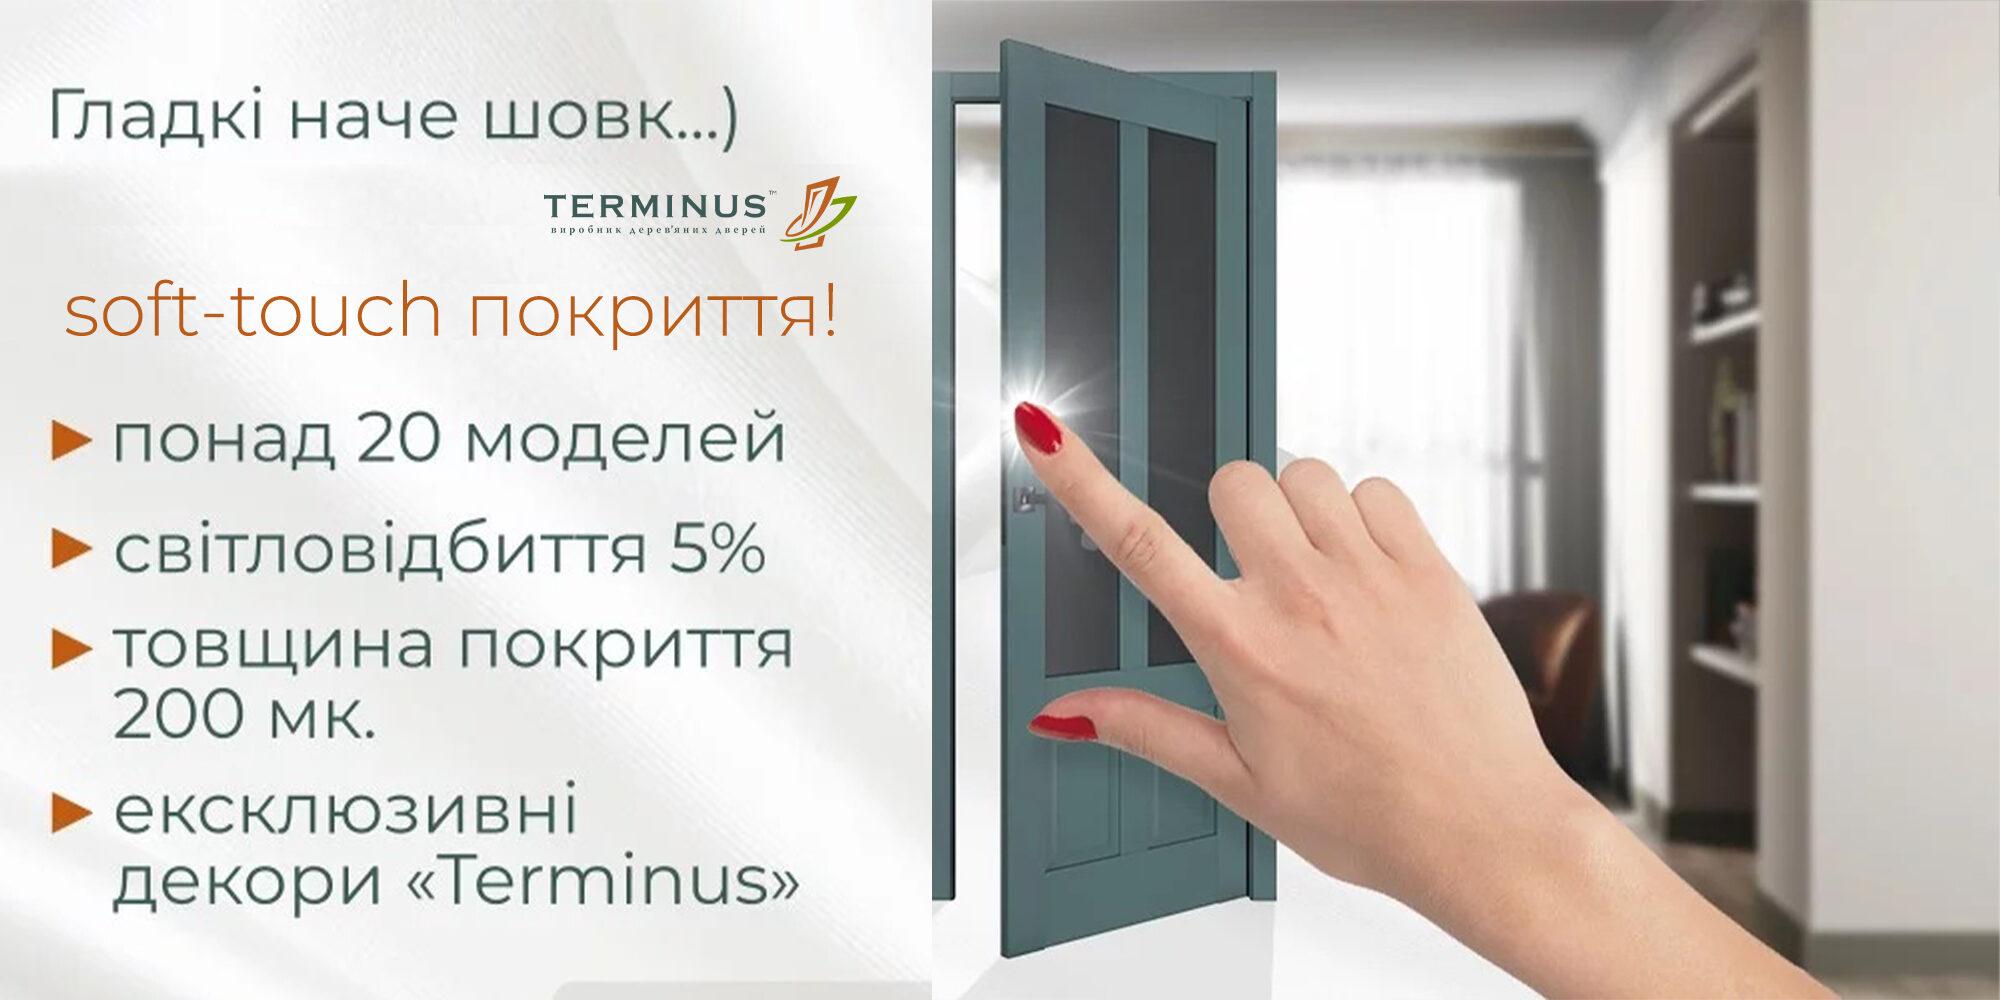 Новинки Terminus Soft-Touch